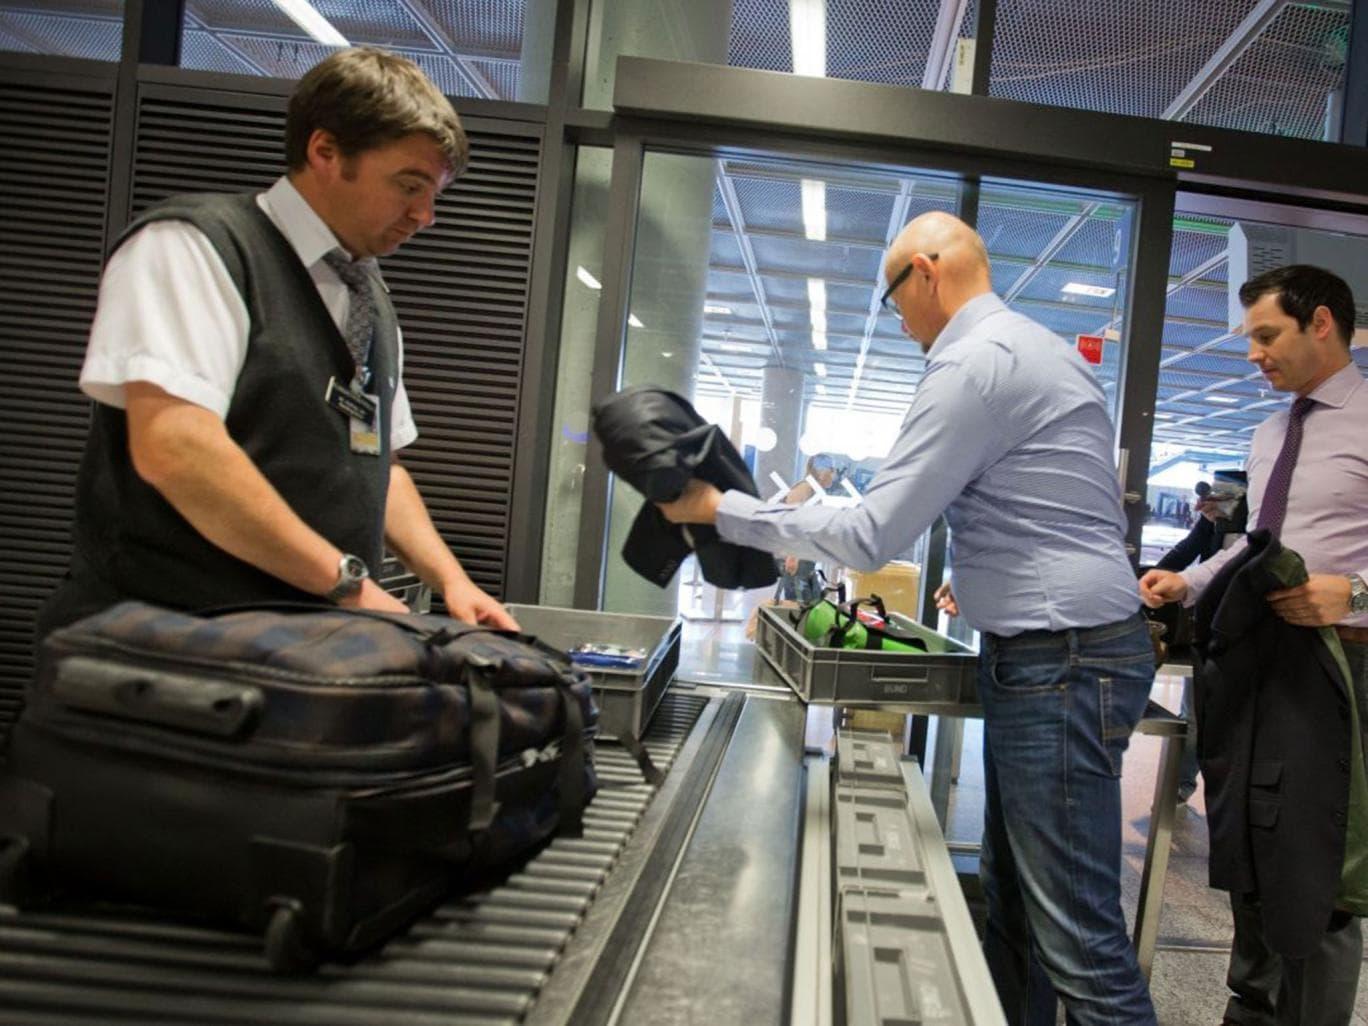 Досмотр безопасности в аэропорту